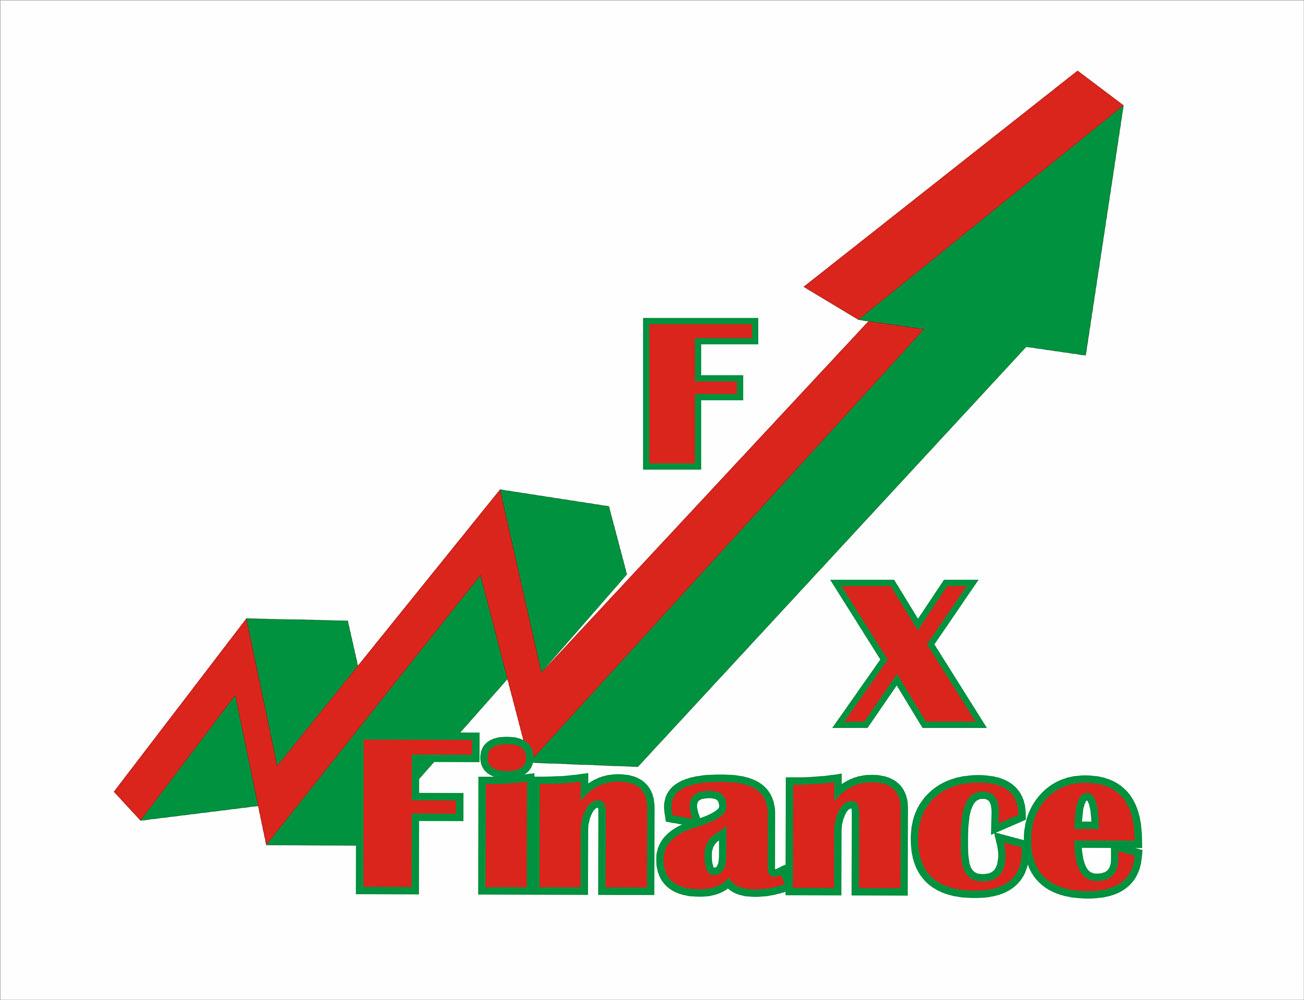 Разработка логотипа для компании FxFinance фото f_33951121a4d4d536.jpg